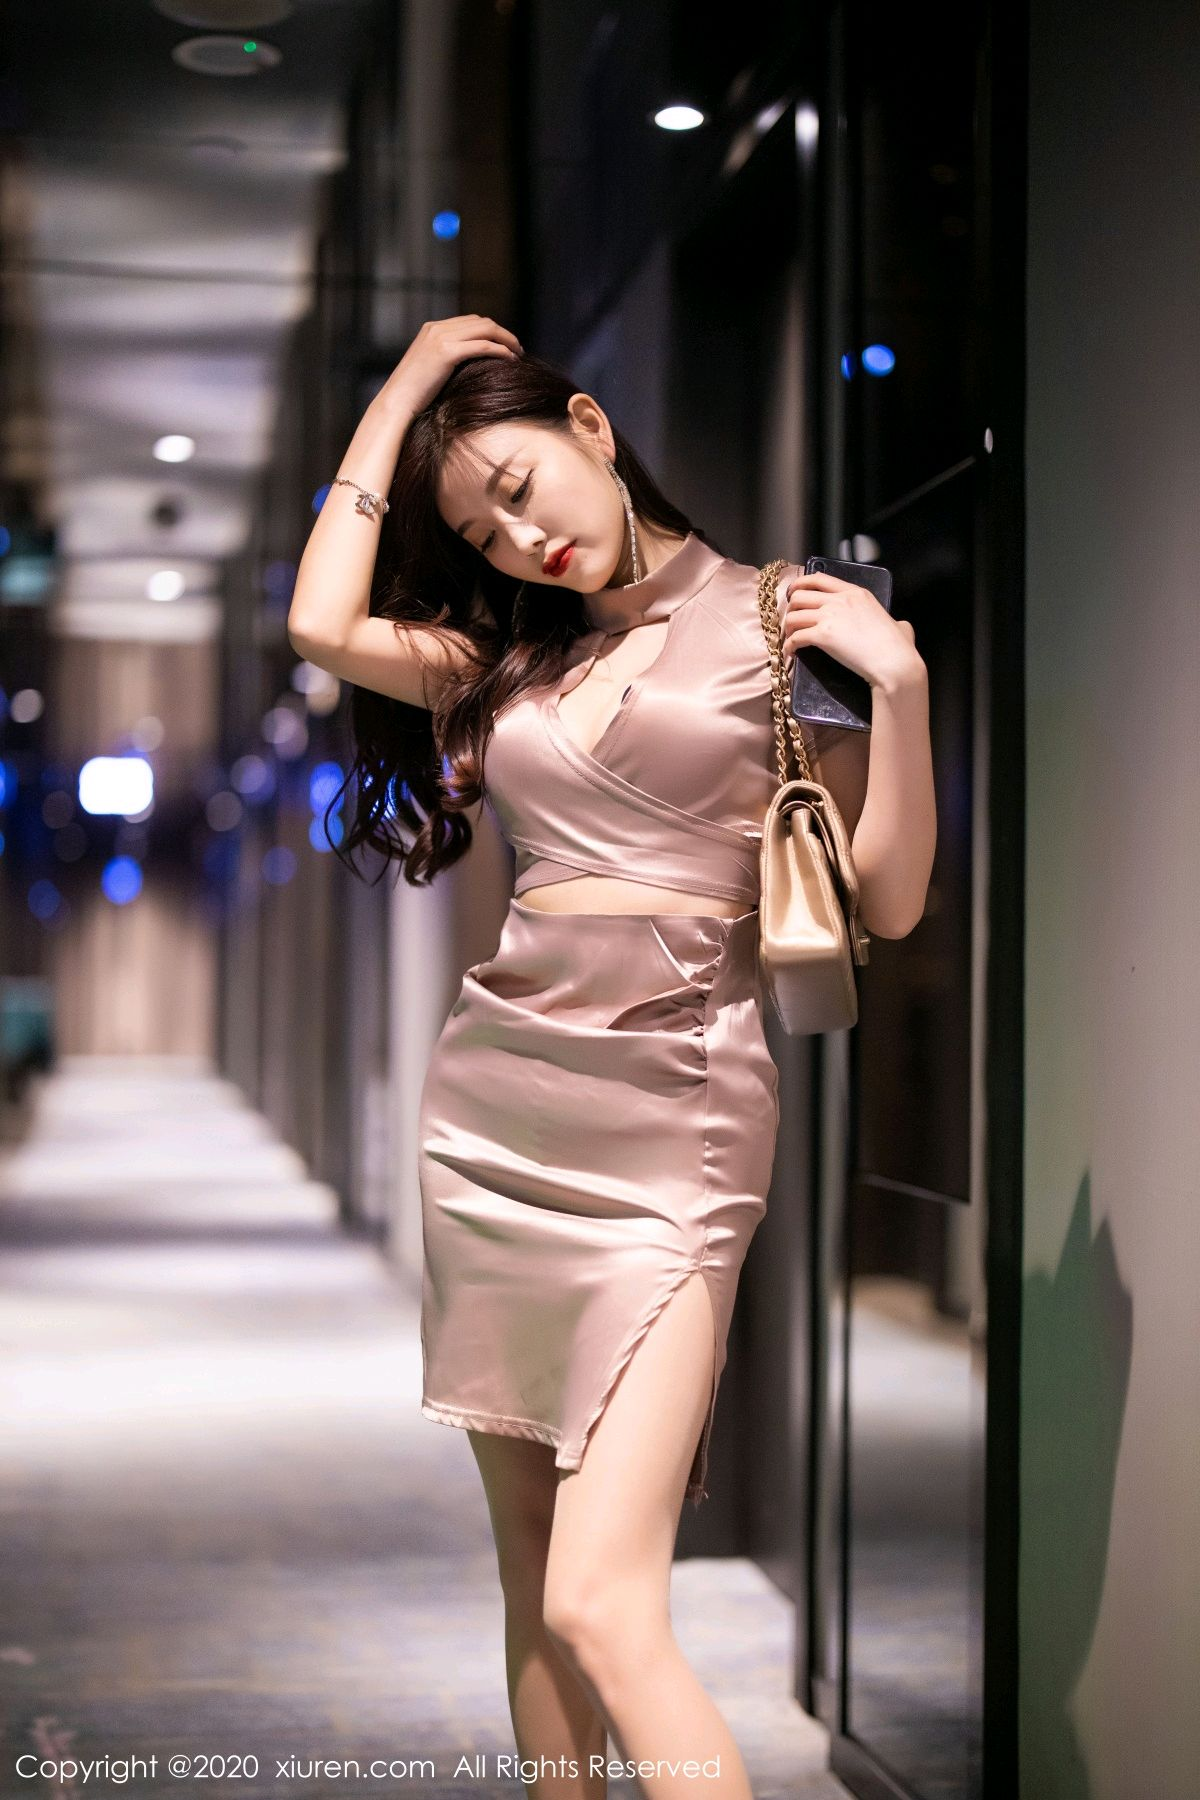 [XiuRen] Vol.2587 Yang Chen Chen 26P, Underwear, Xiuren, Yang Chen Chen